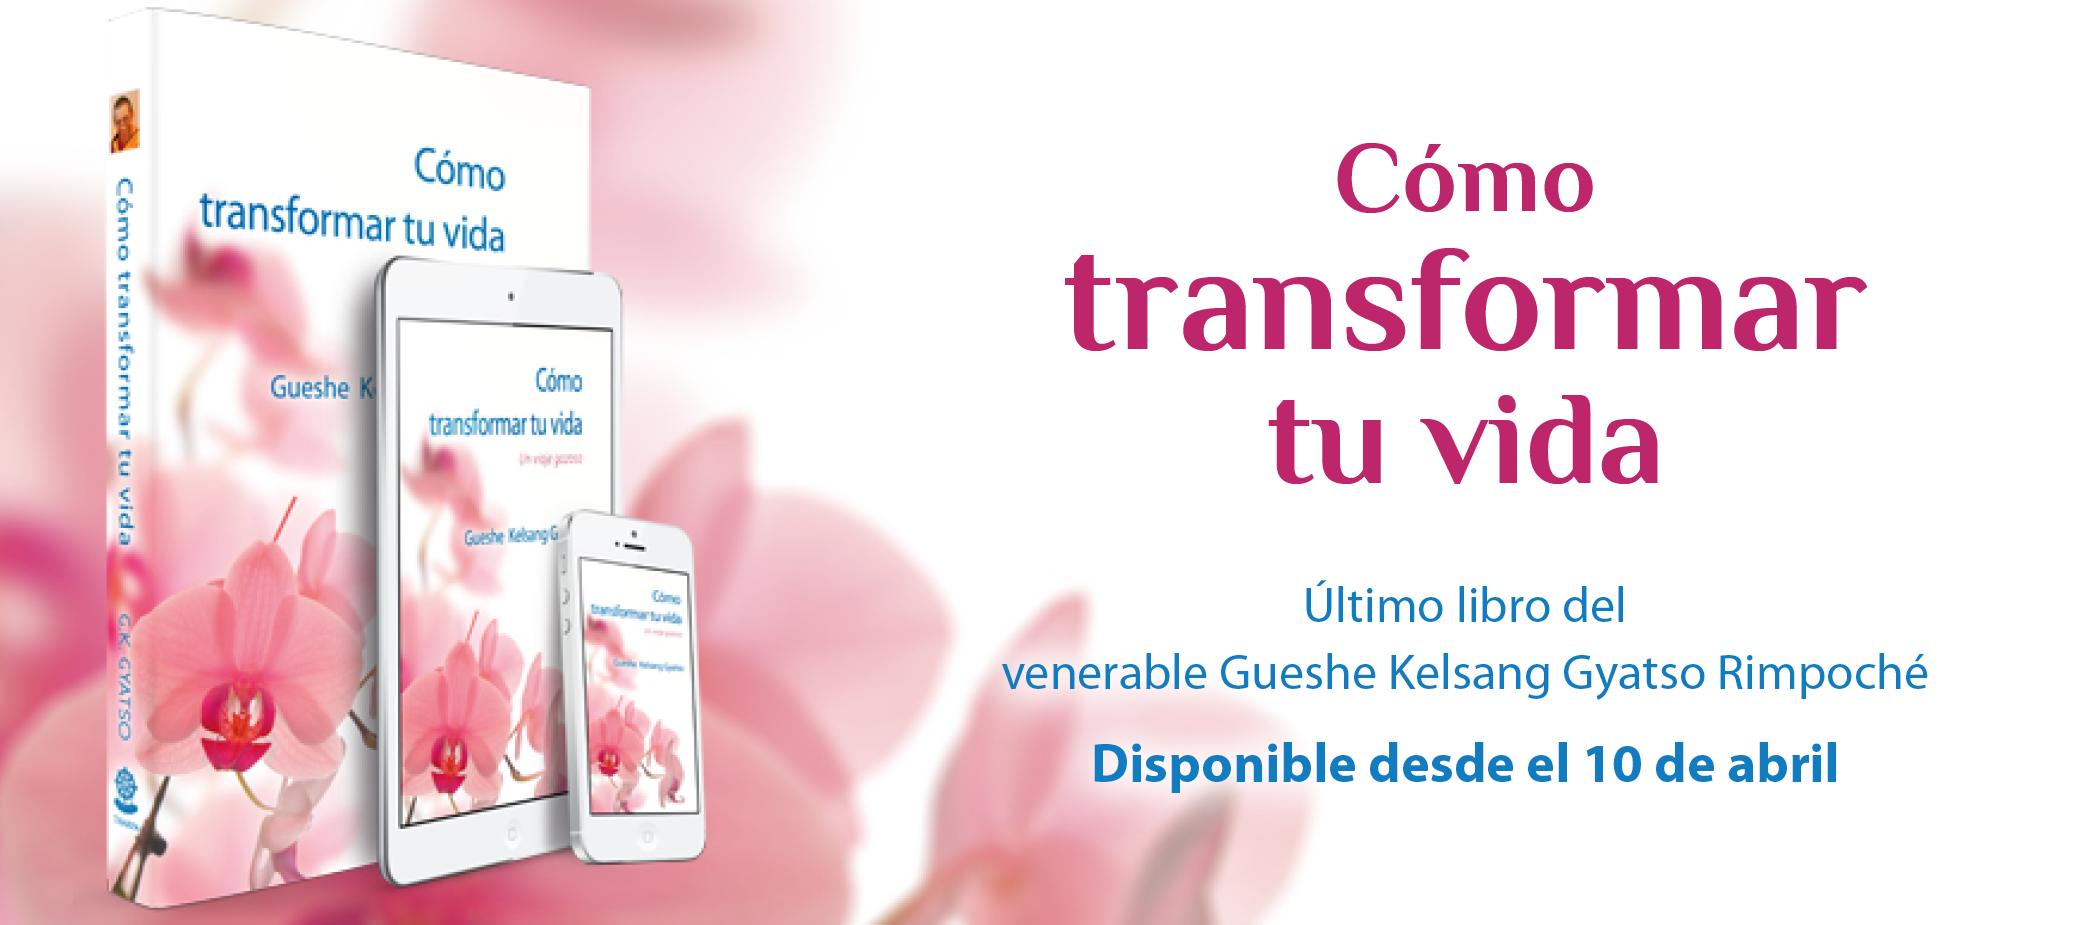 Ebook gratis